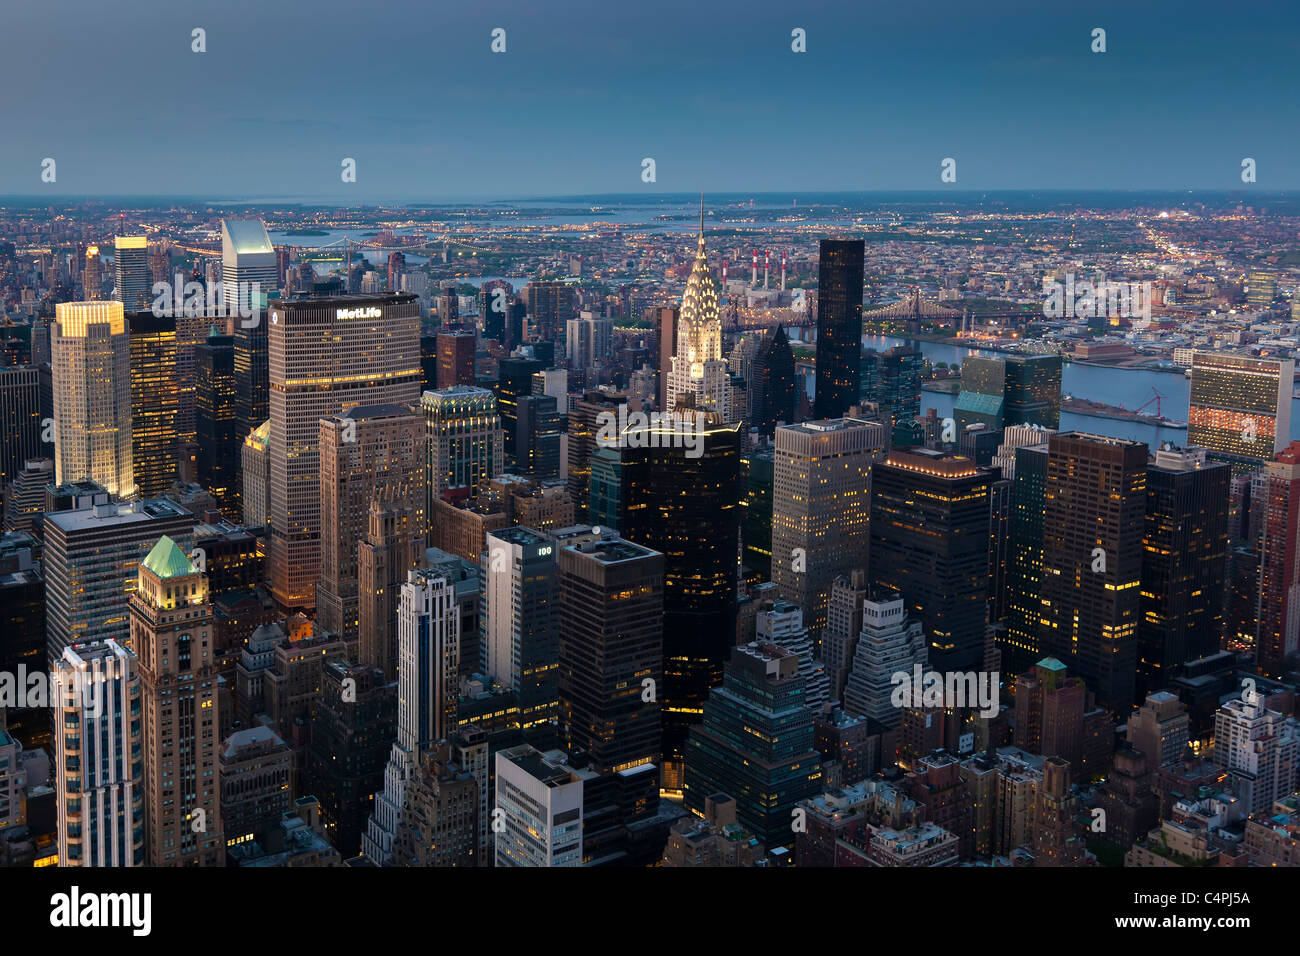 Skyscrapers, Manhattan, New York, USA - Stock Image